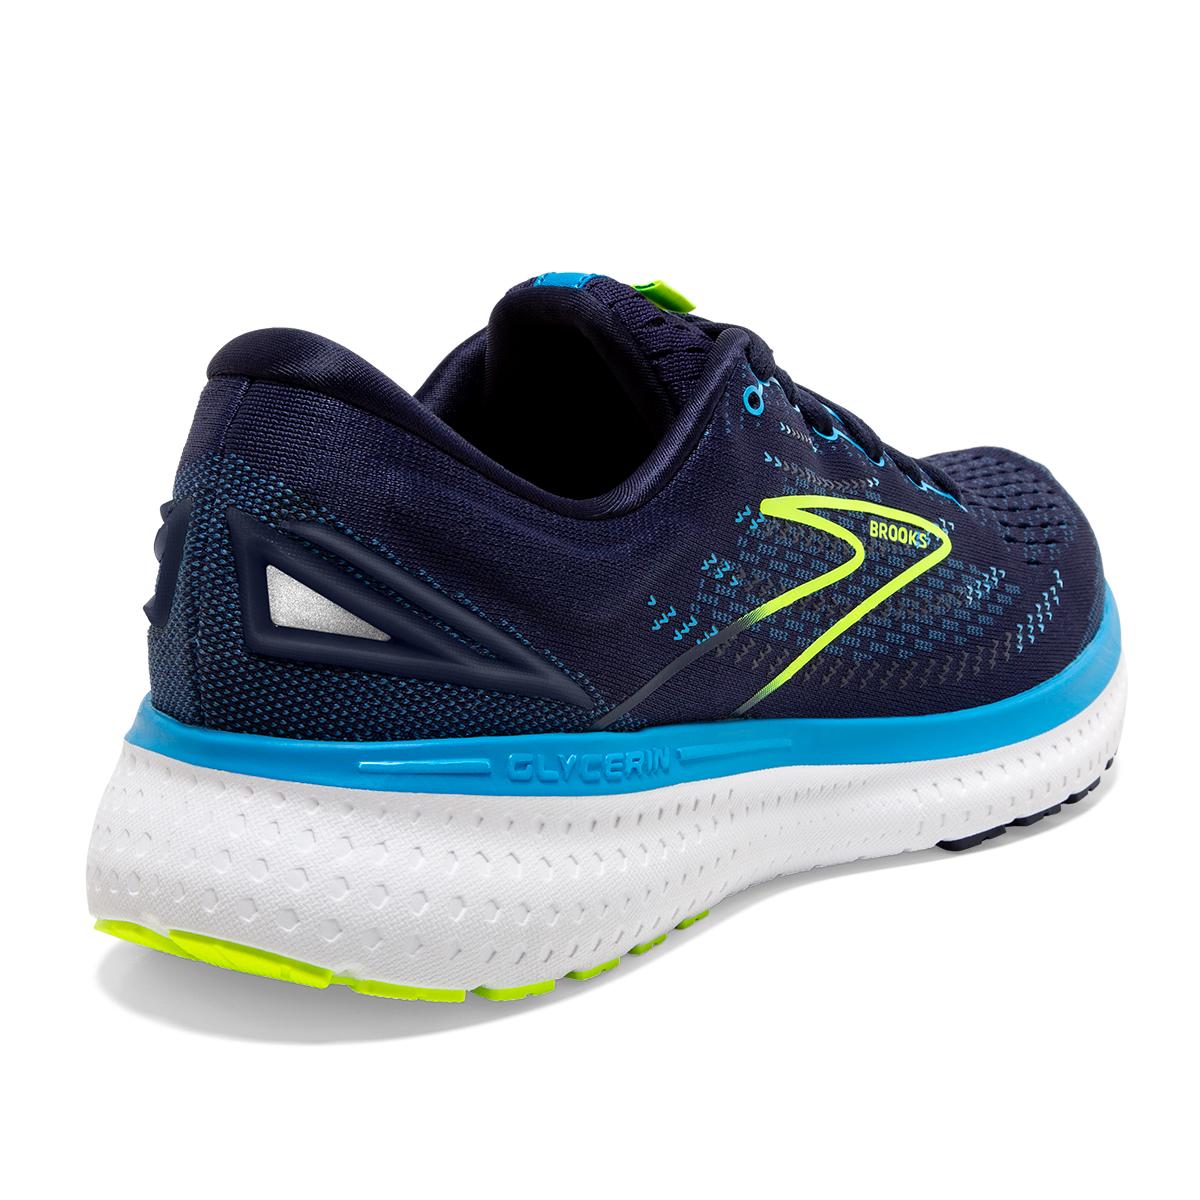 Men's Brooks Glycerin 19 Running Shoe - Color: Navy/Blue/Night - Size: 7 - Width: Regular, Navy/Blue/Night, large, image 6